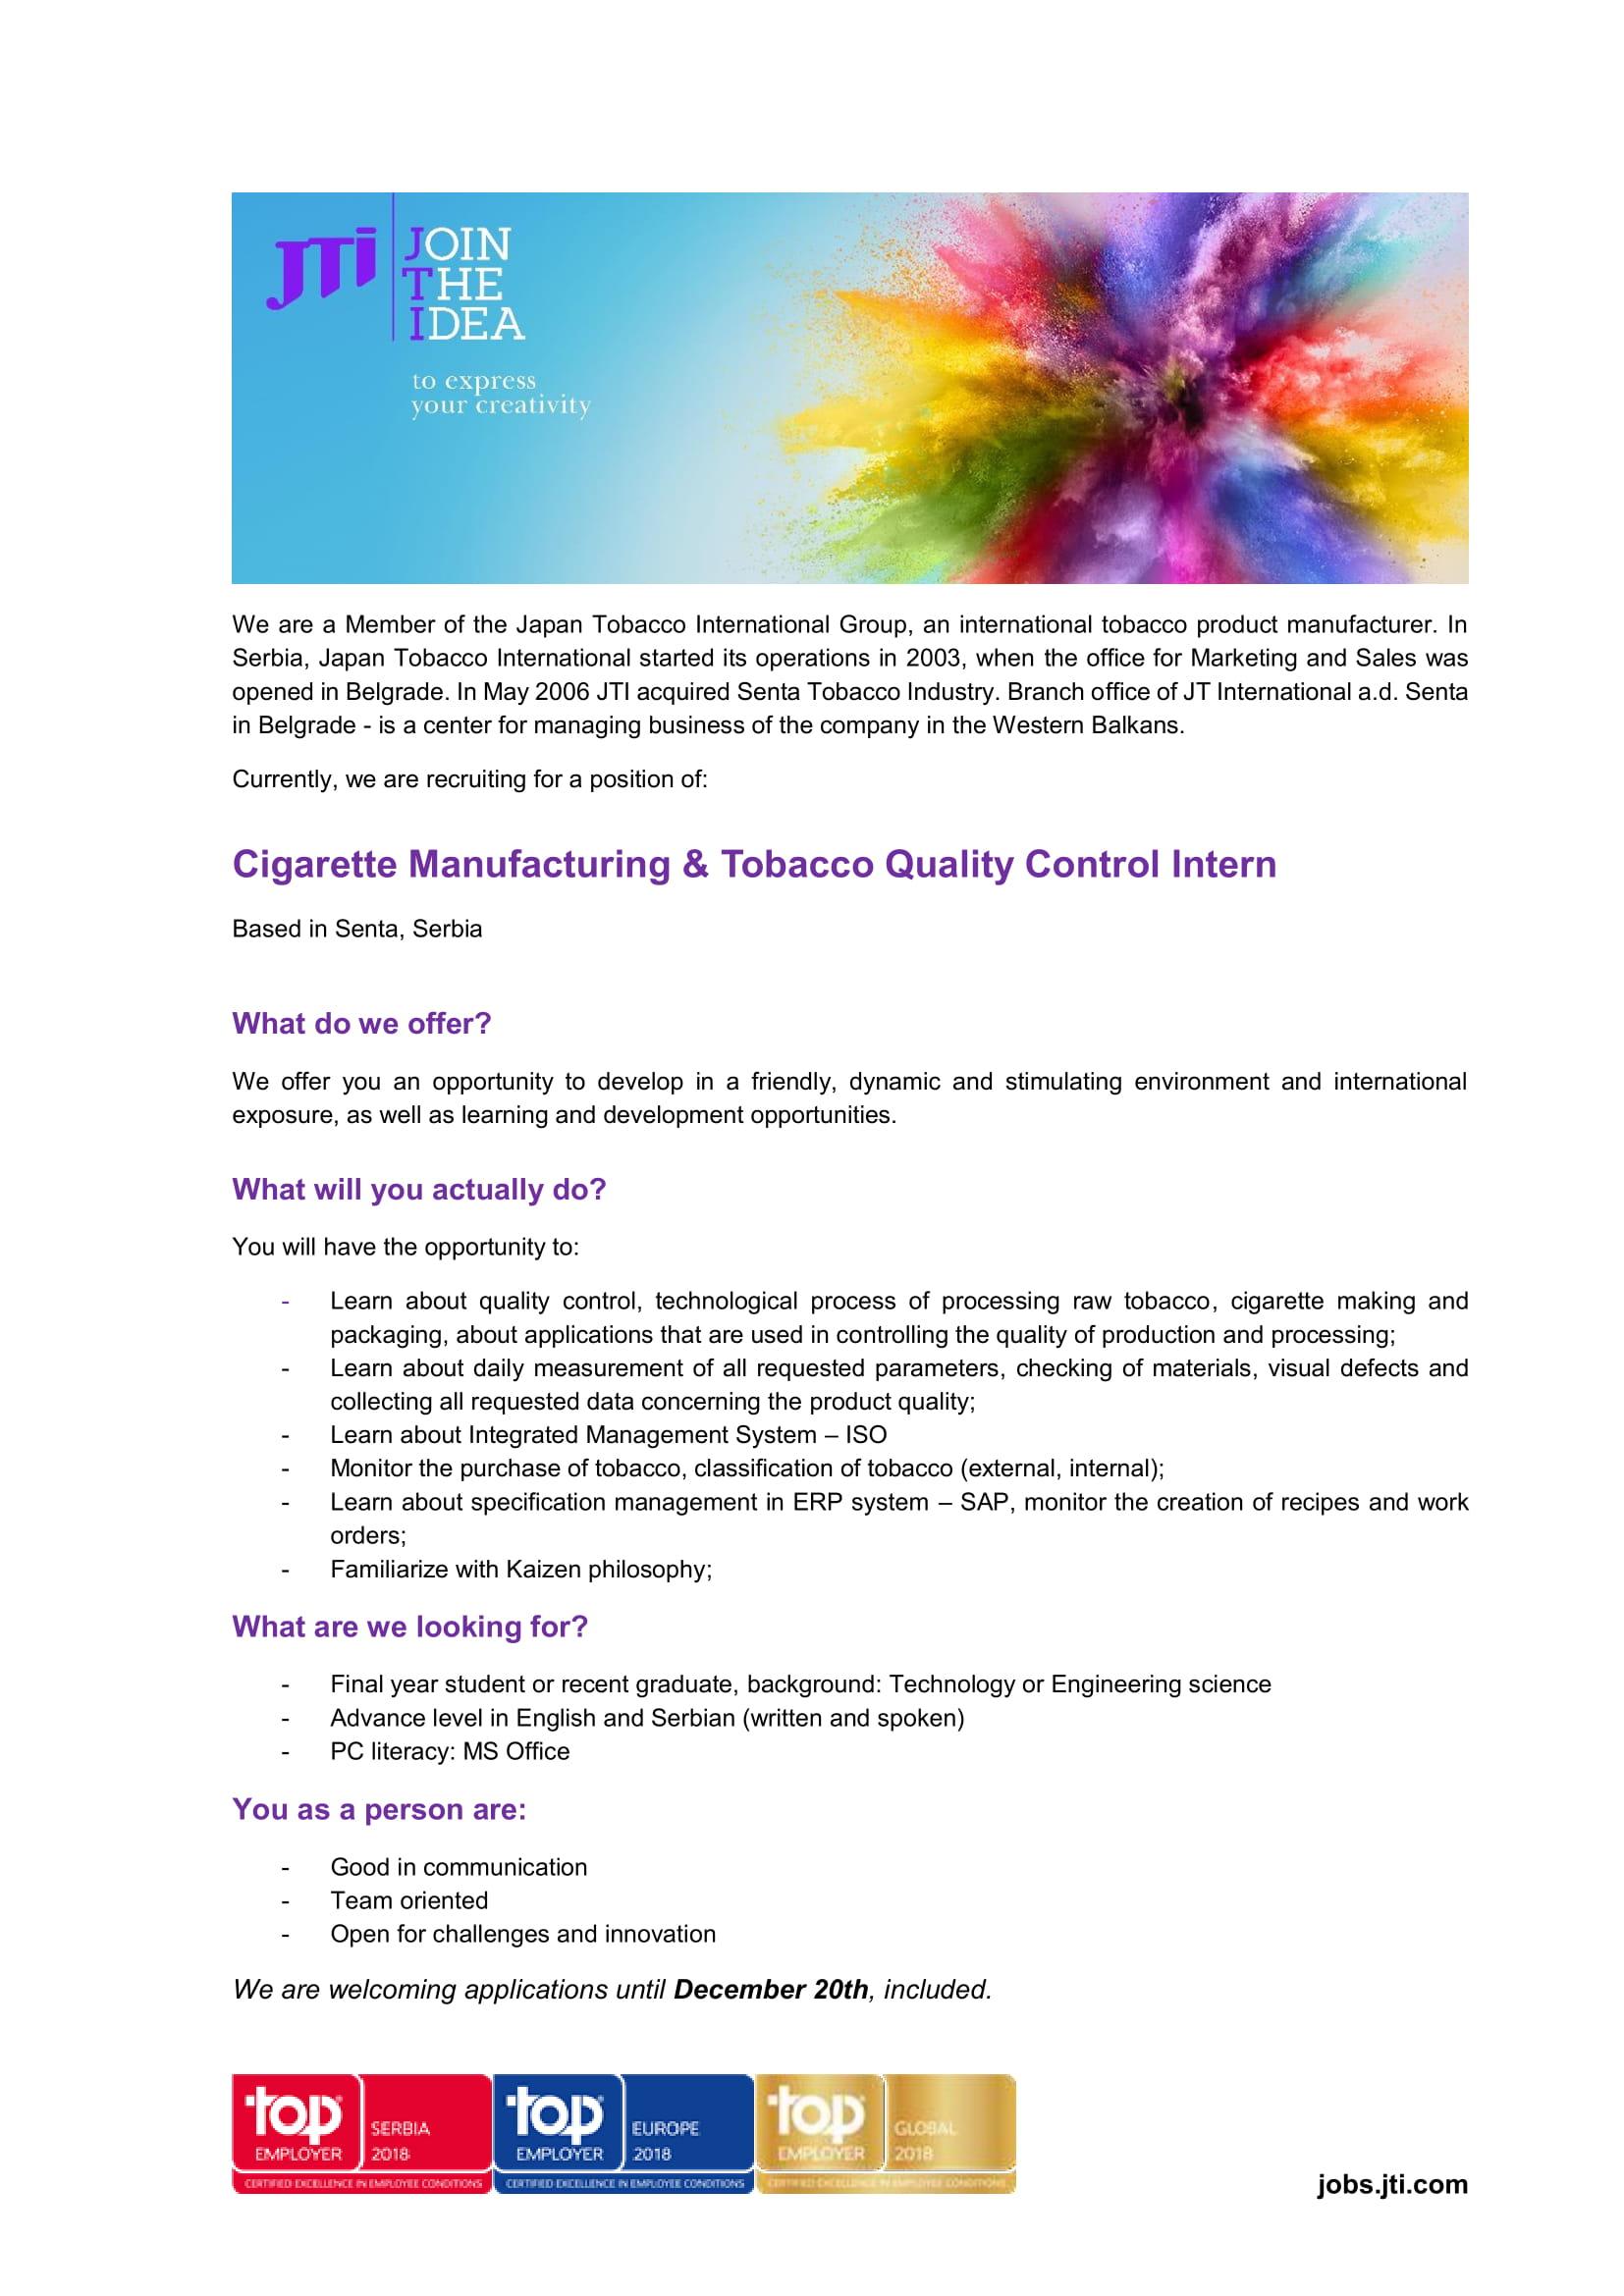 Cigarette Manufacturing & Tobacco Quality Control Intern